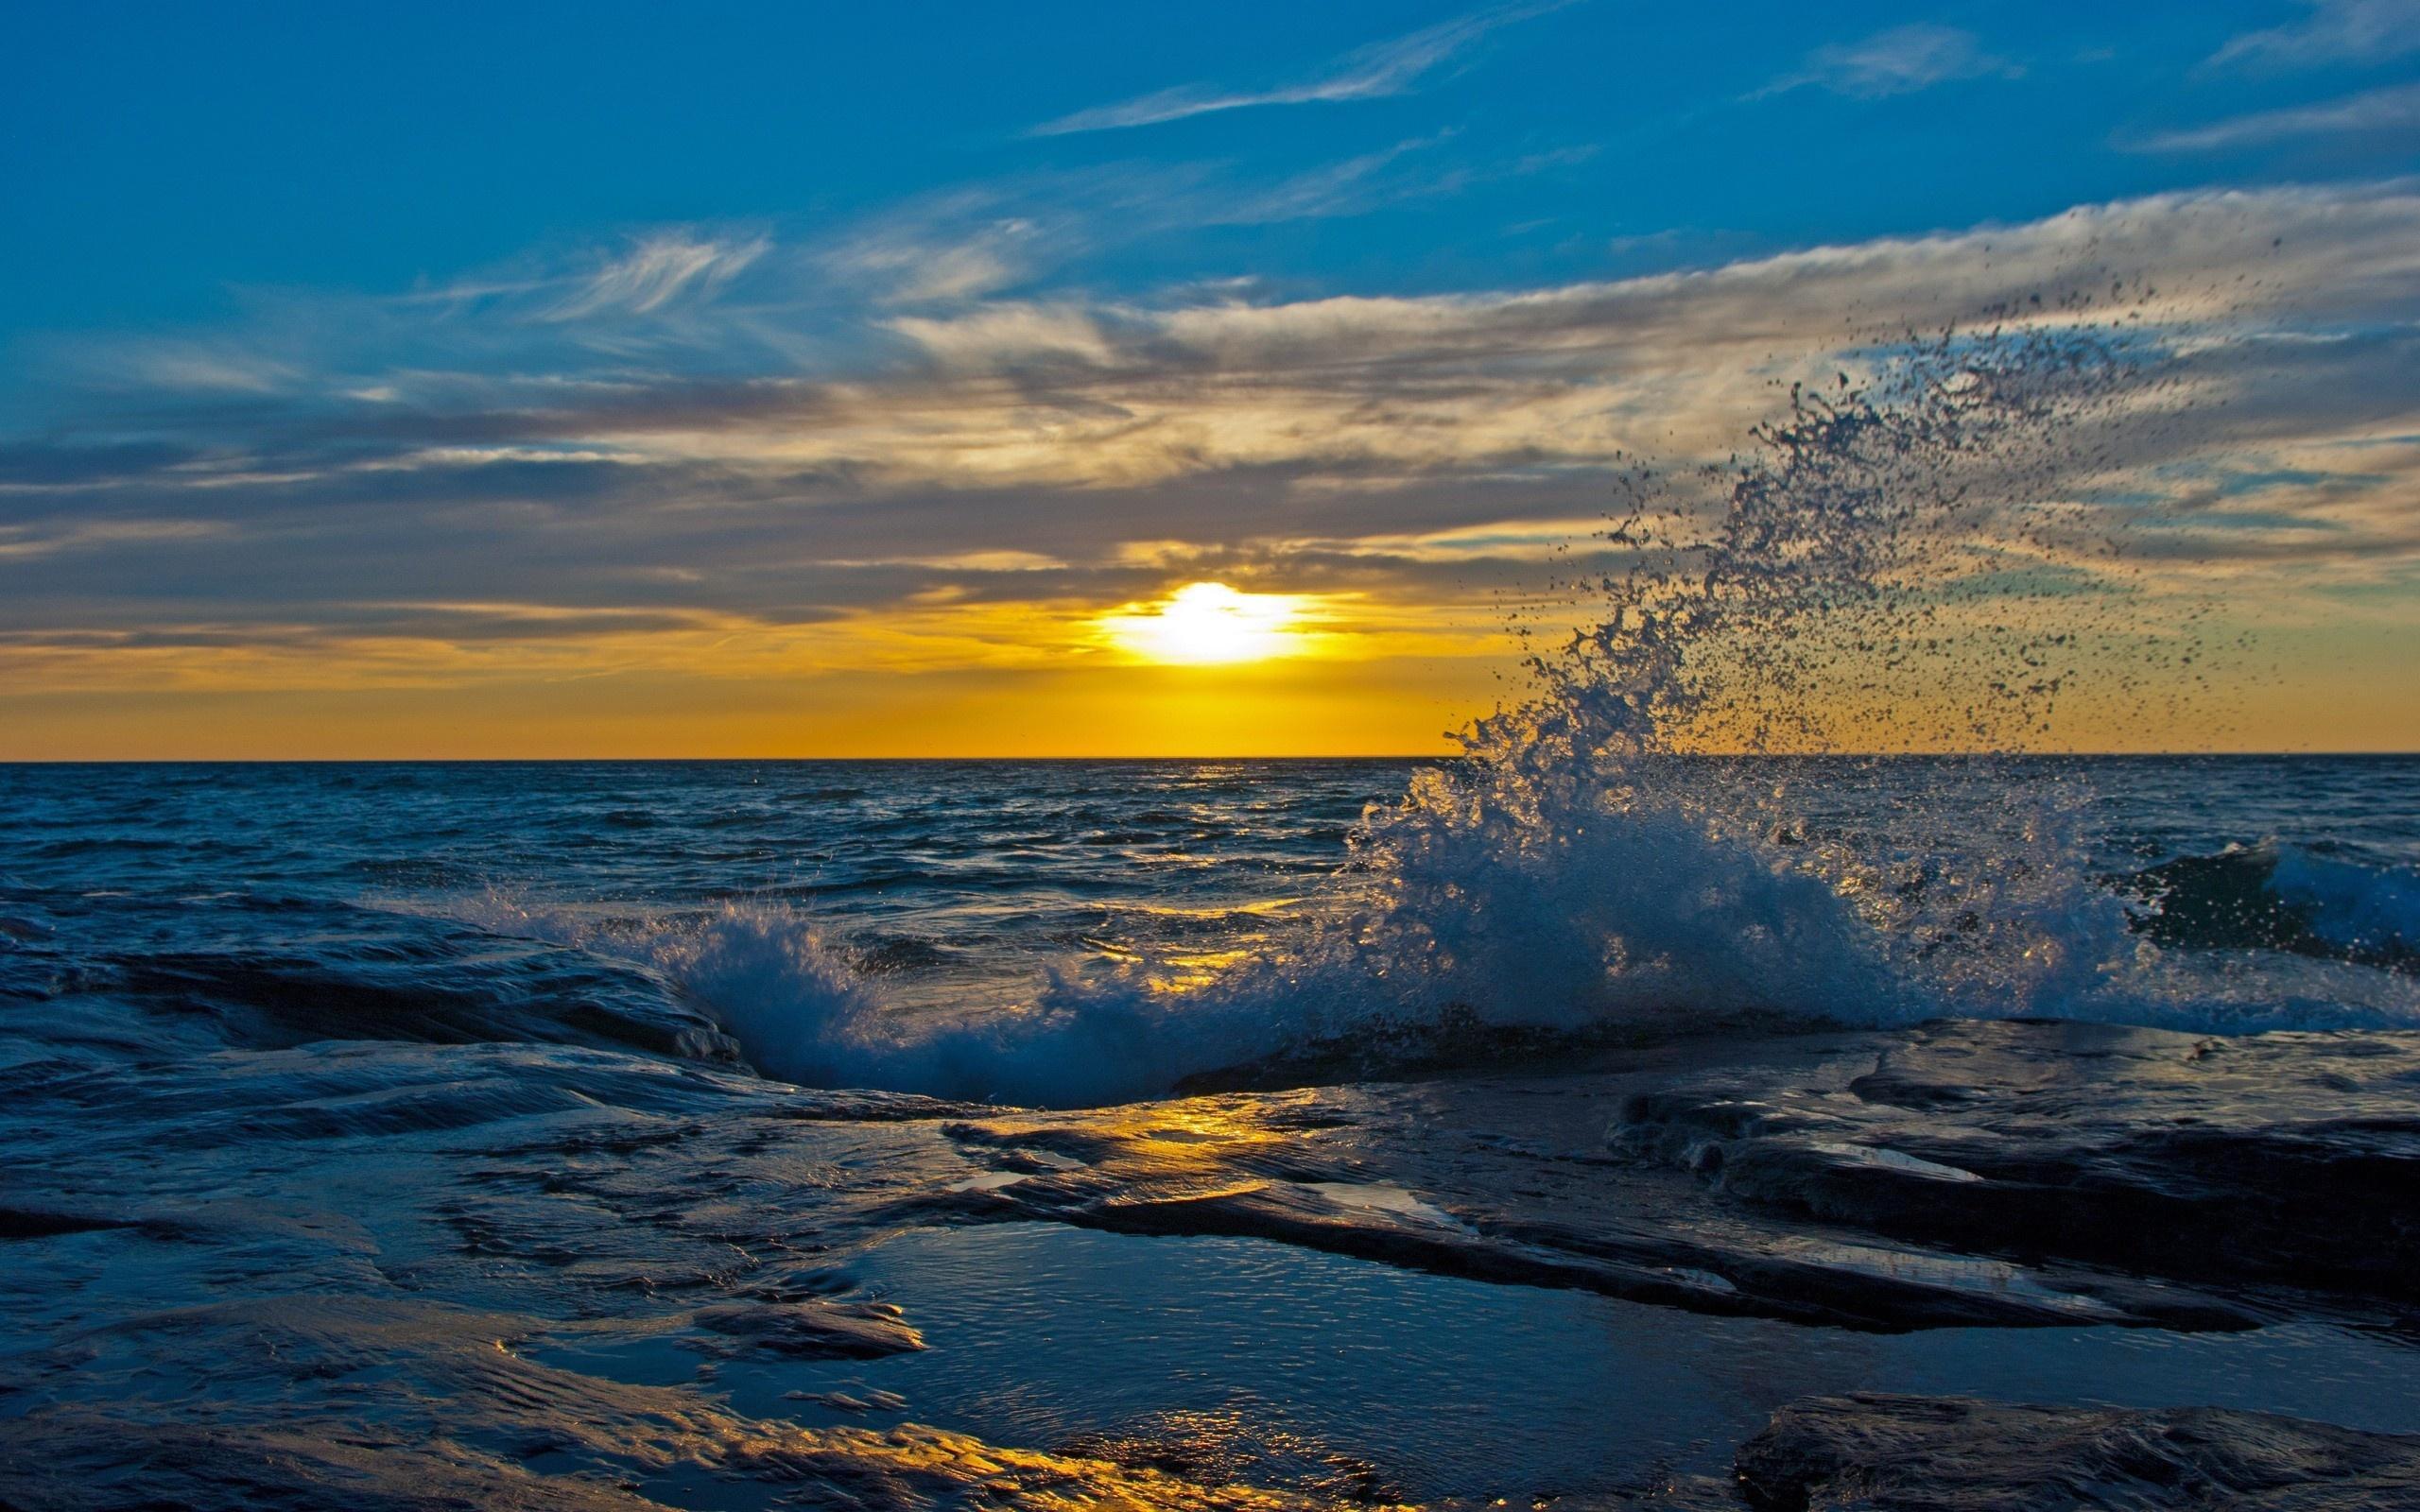 закат над бушующим морем  № 602852 без смс